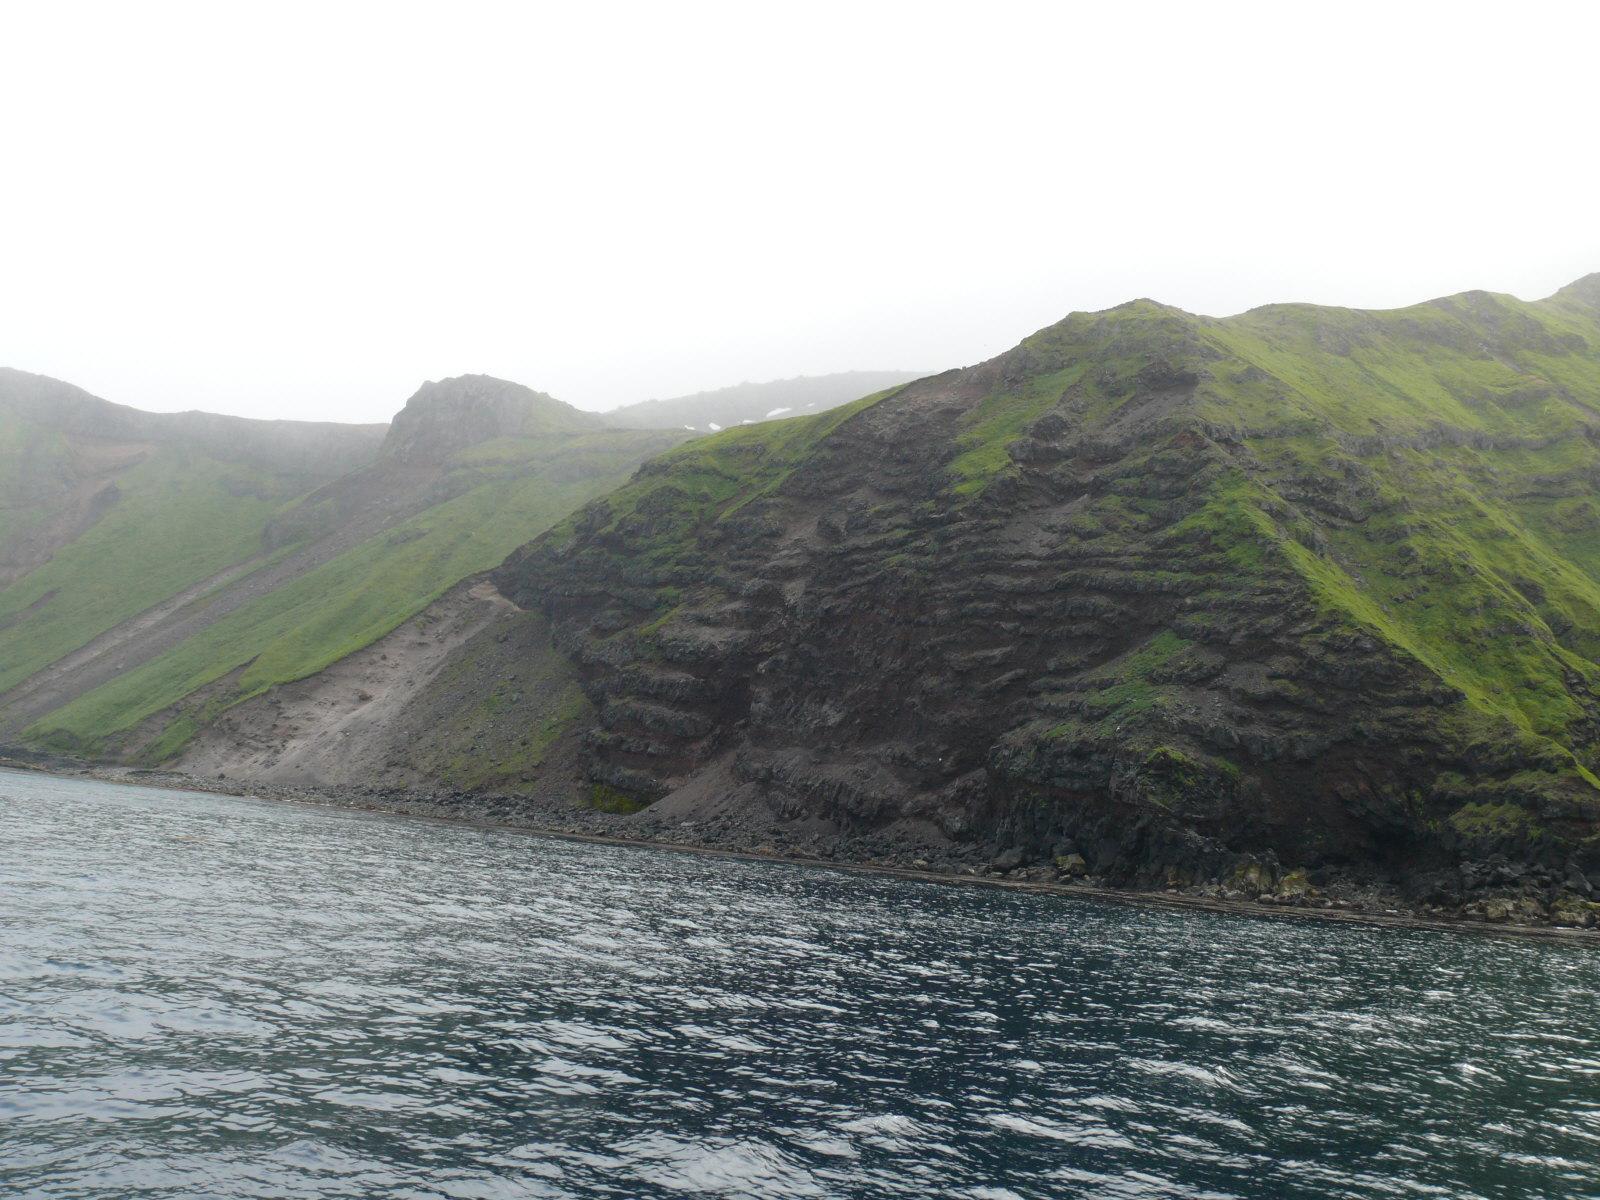 Resultado de imagem para little sitkin island